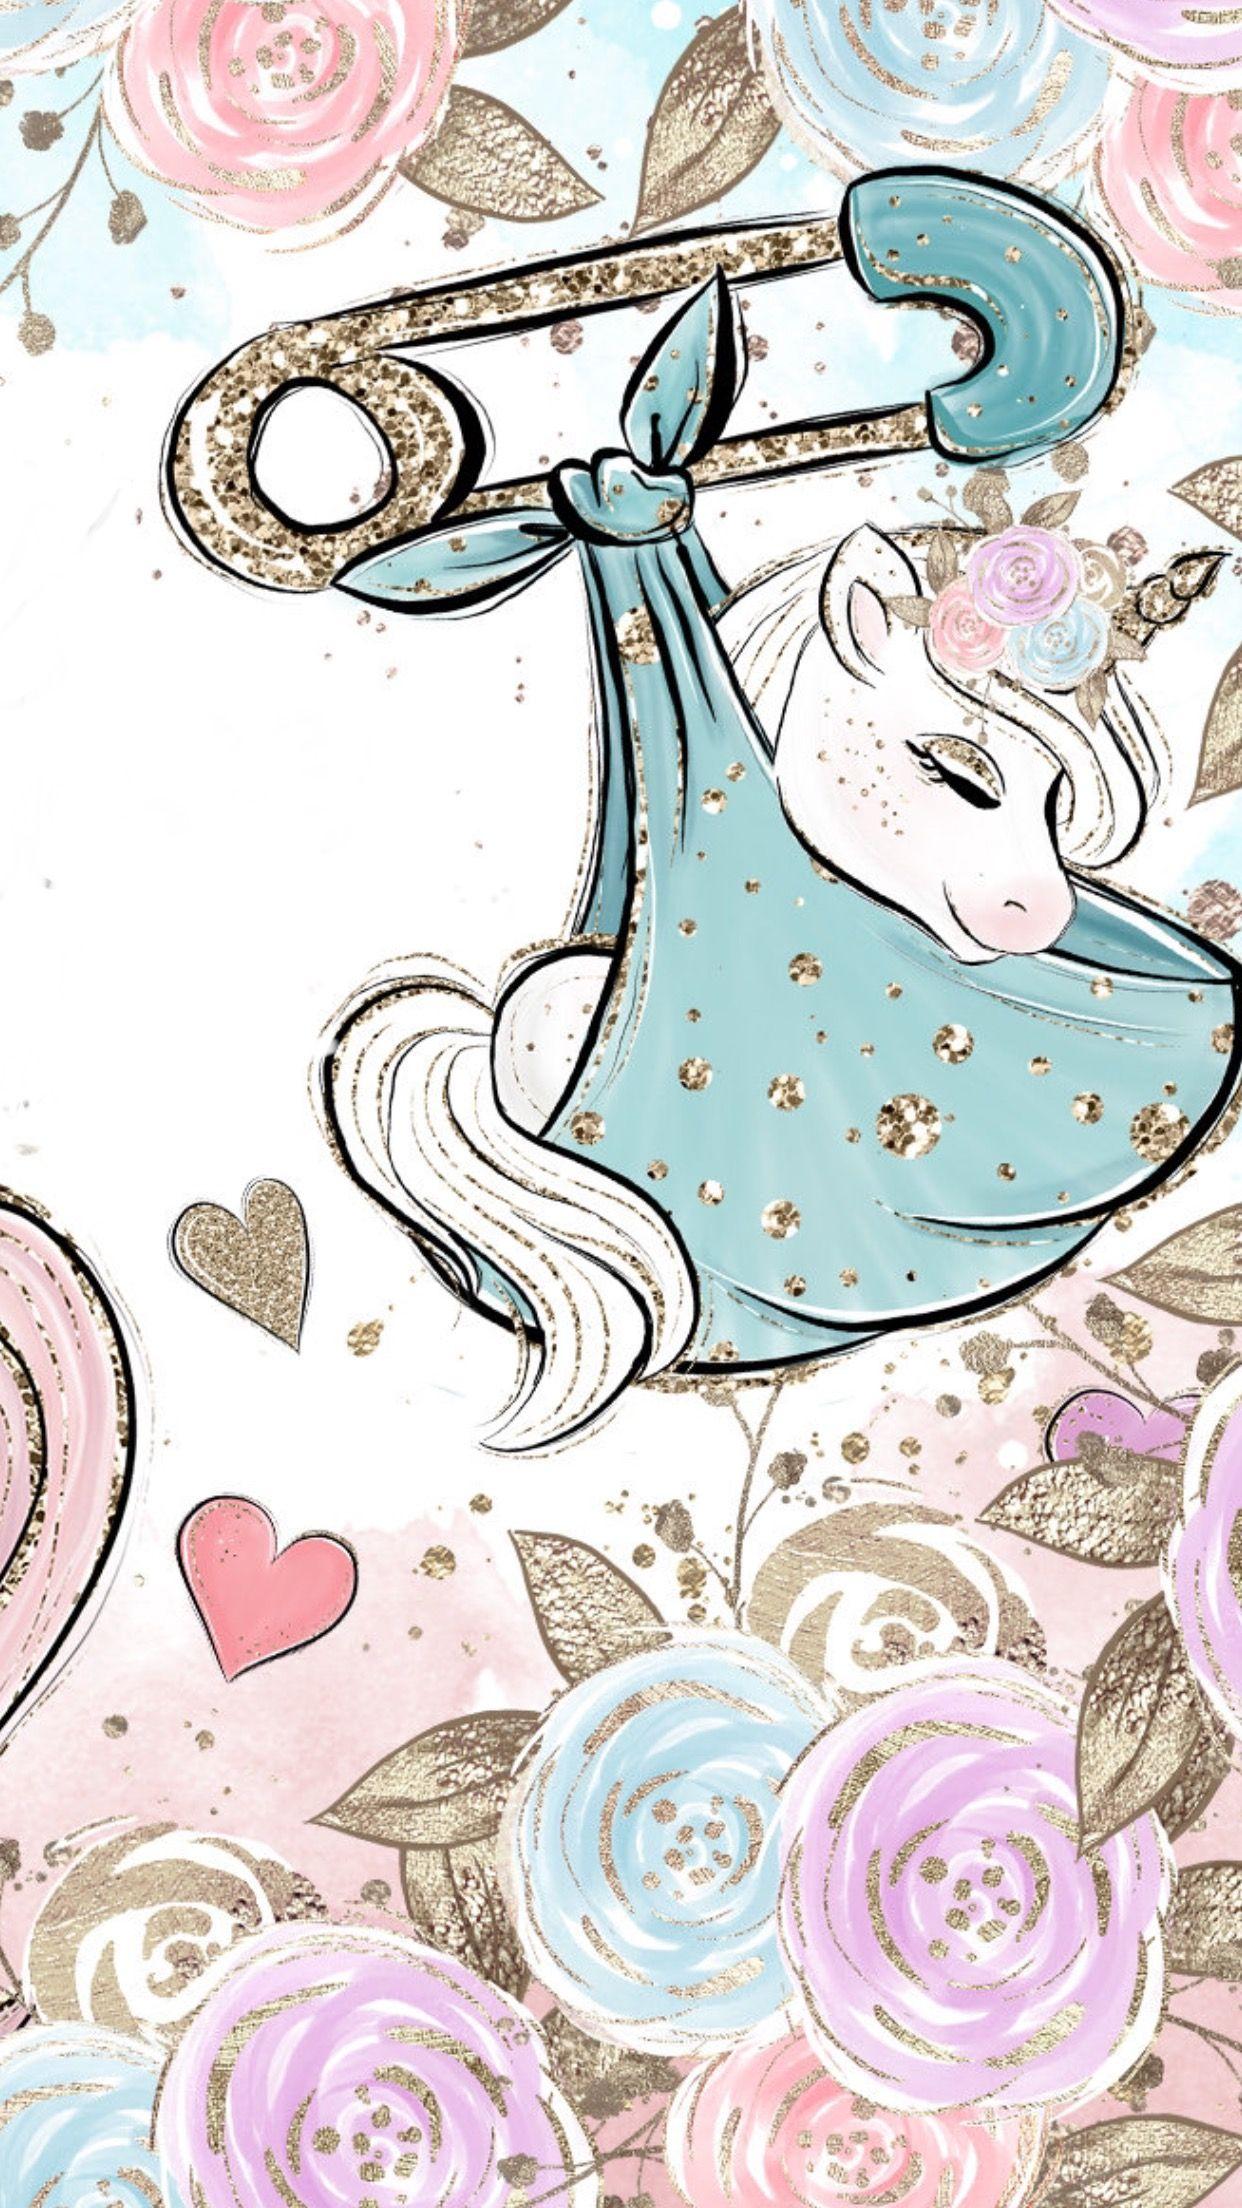 Aww Baby Unicorn Being Delivered Unicorns Wallpaper Unicorn